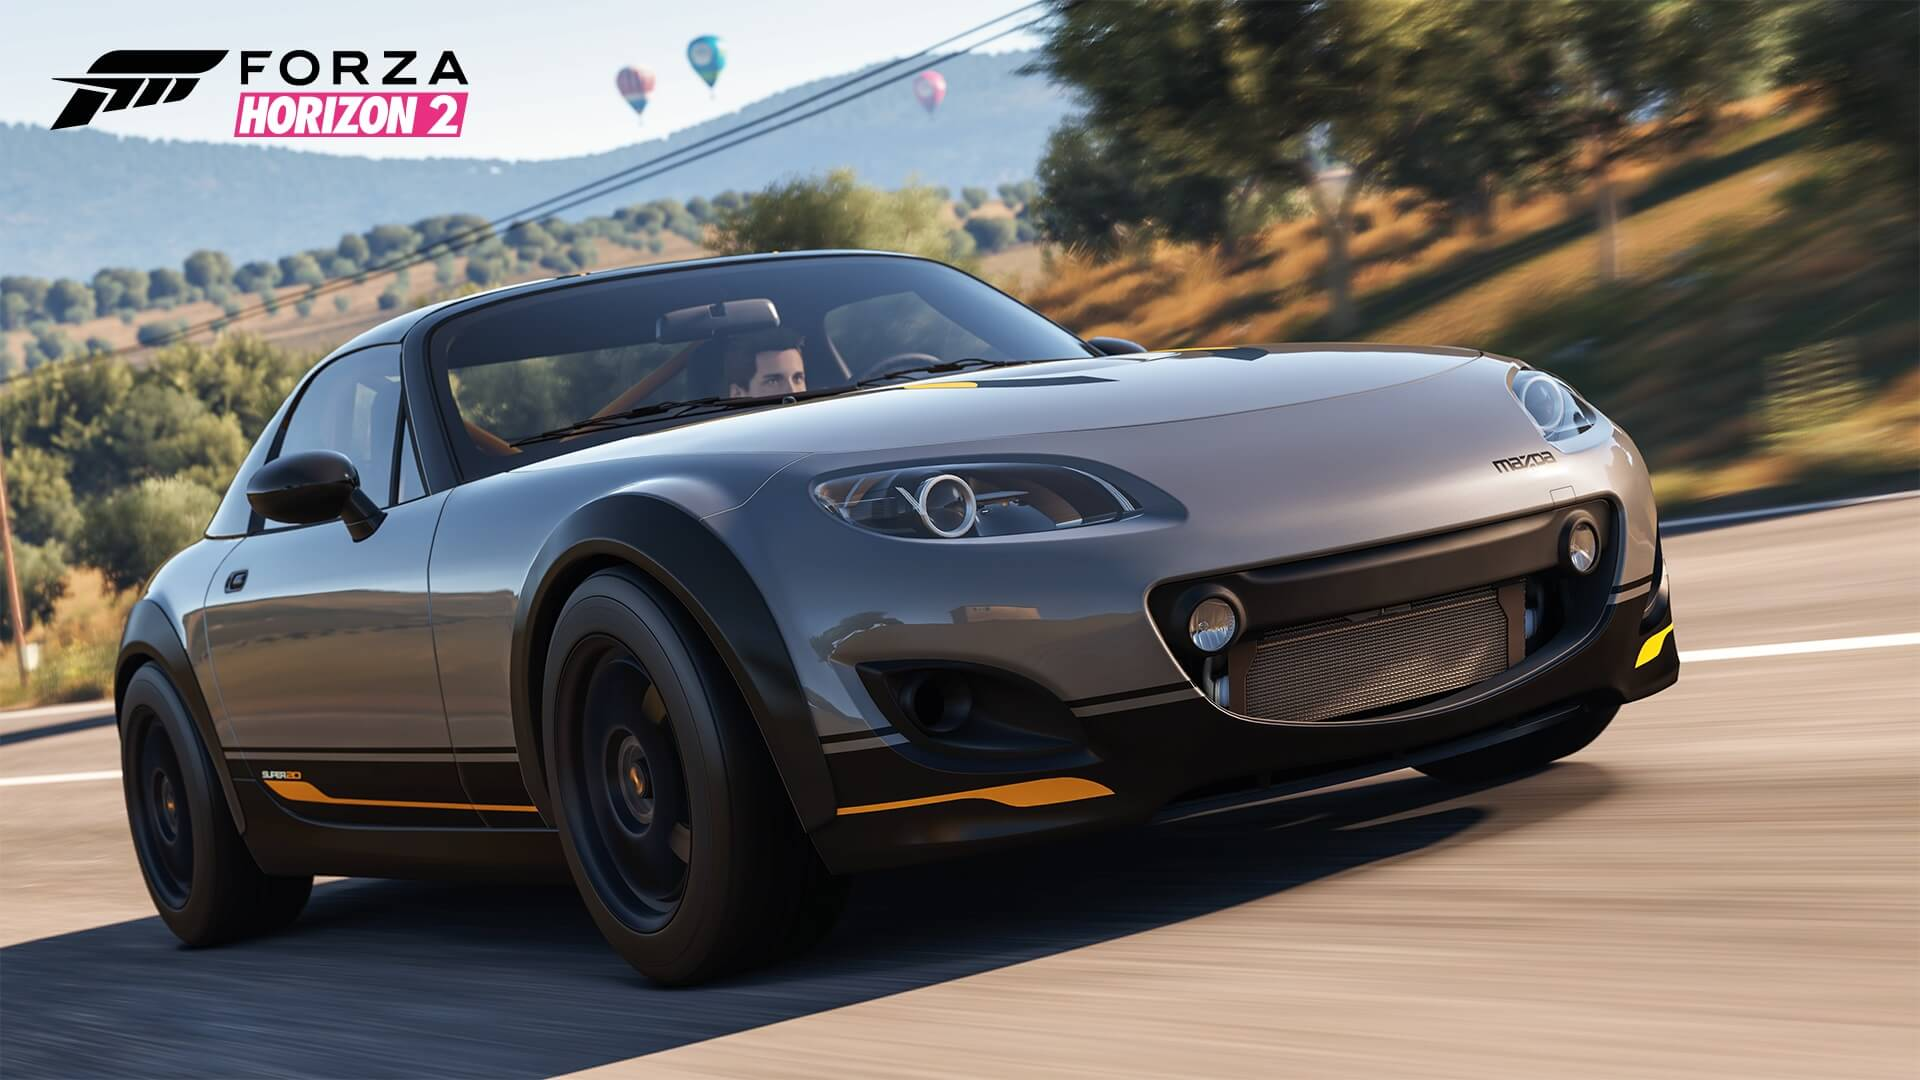 news show more rf rear features mx miata revealed three price quarter mazda exclusive